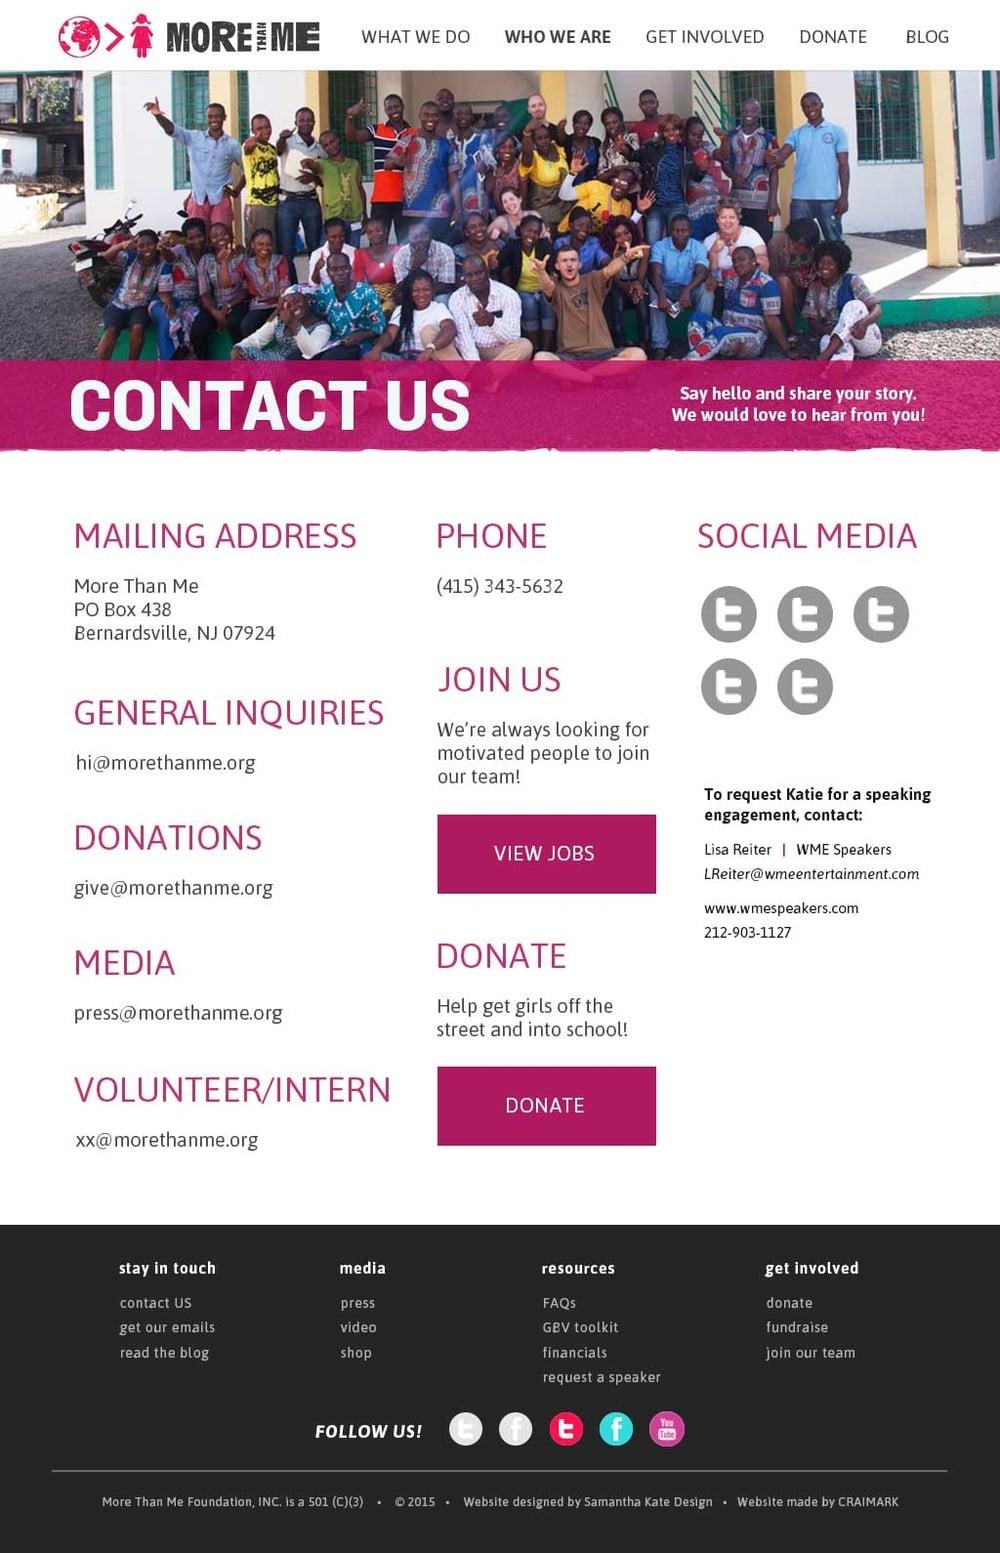 MTM_web-responsive_contact-us.jpg